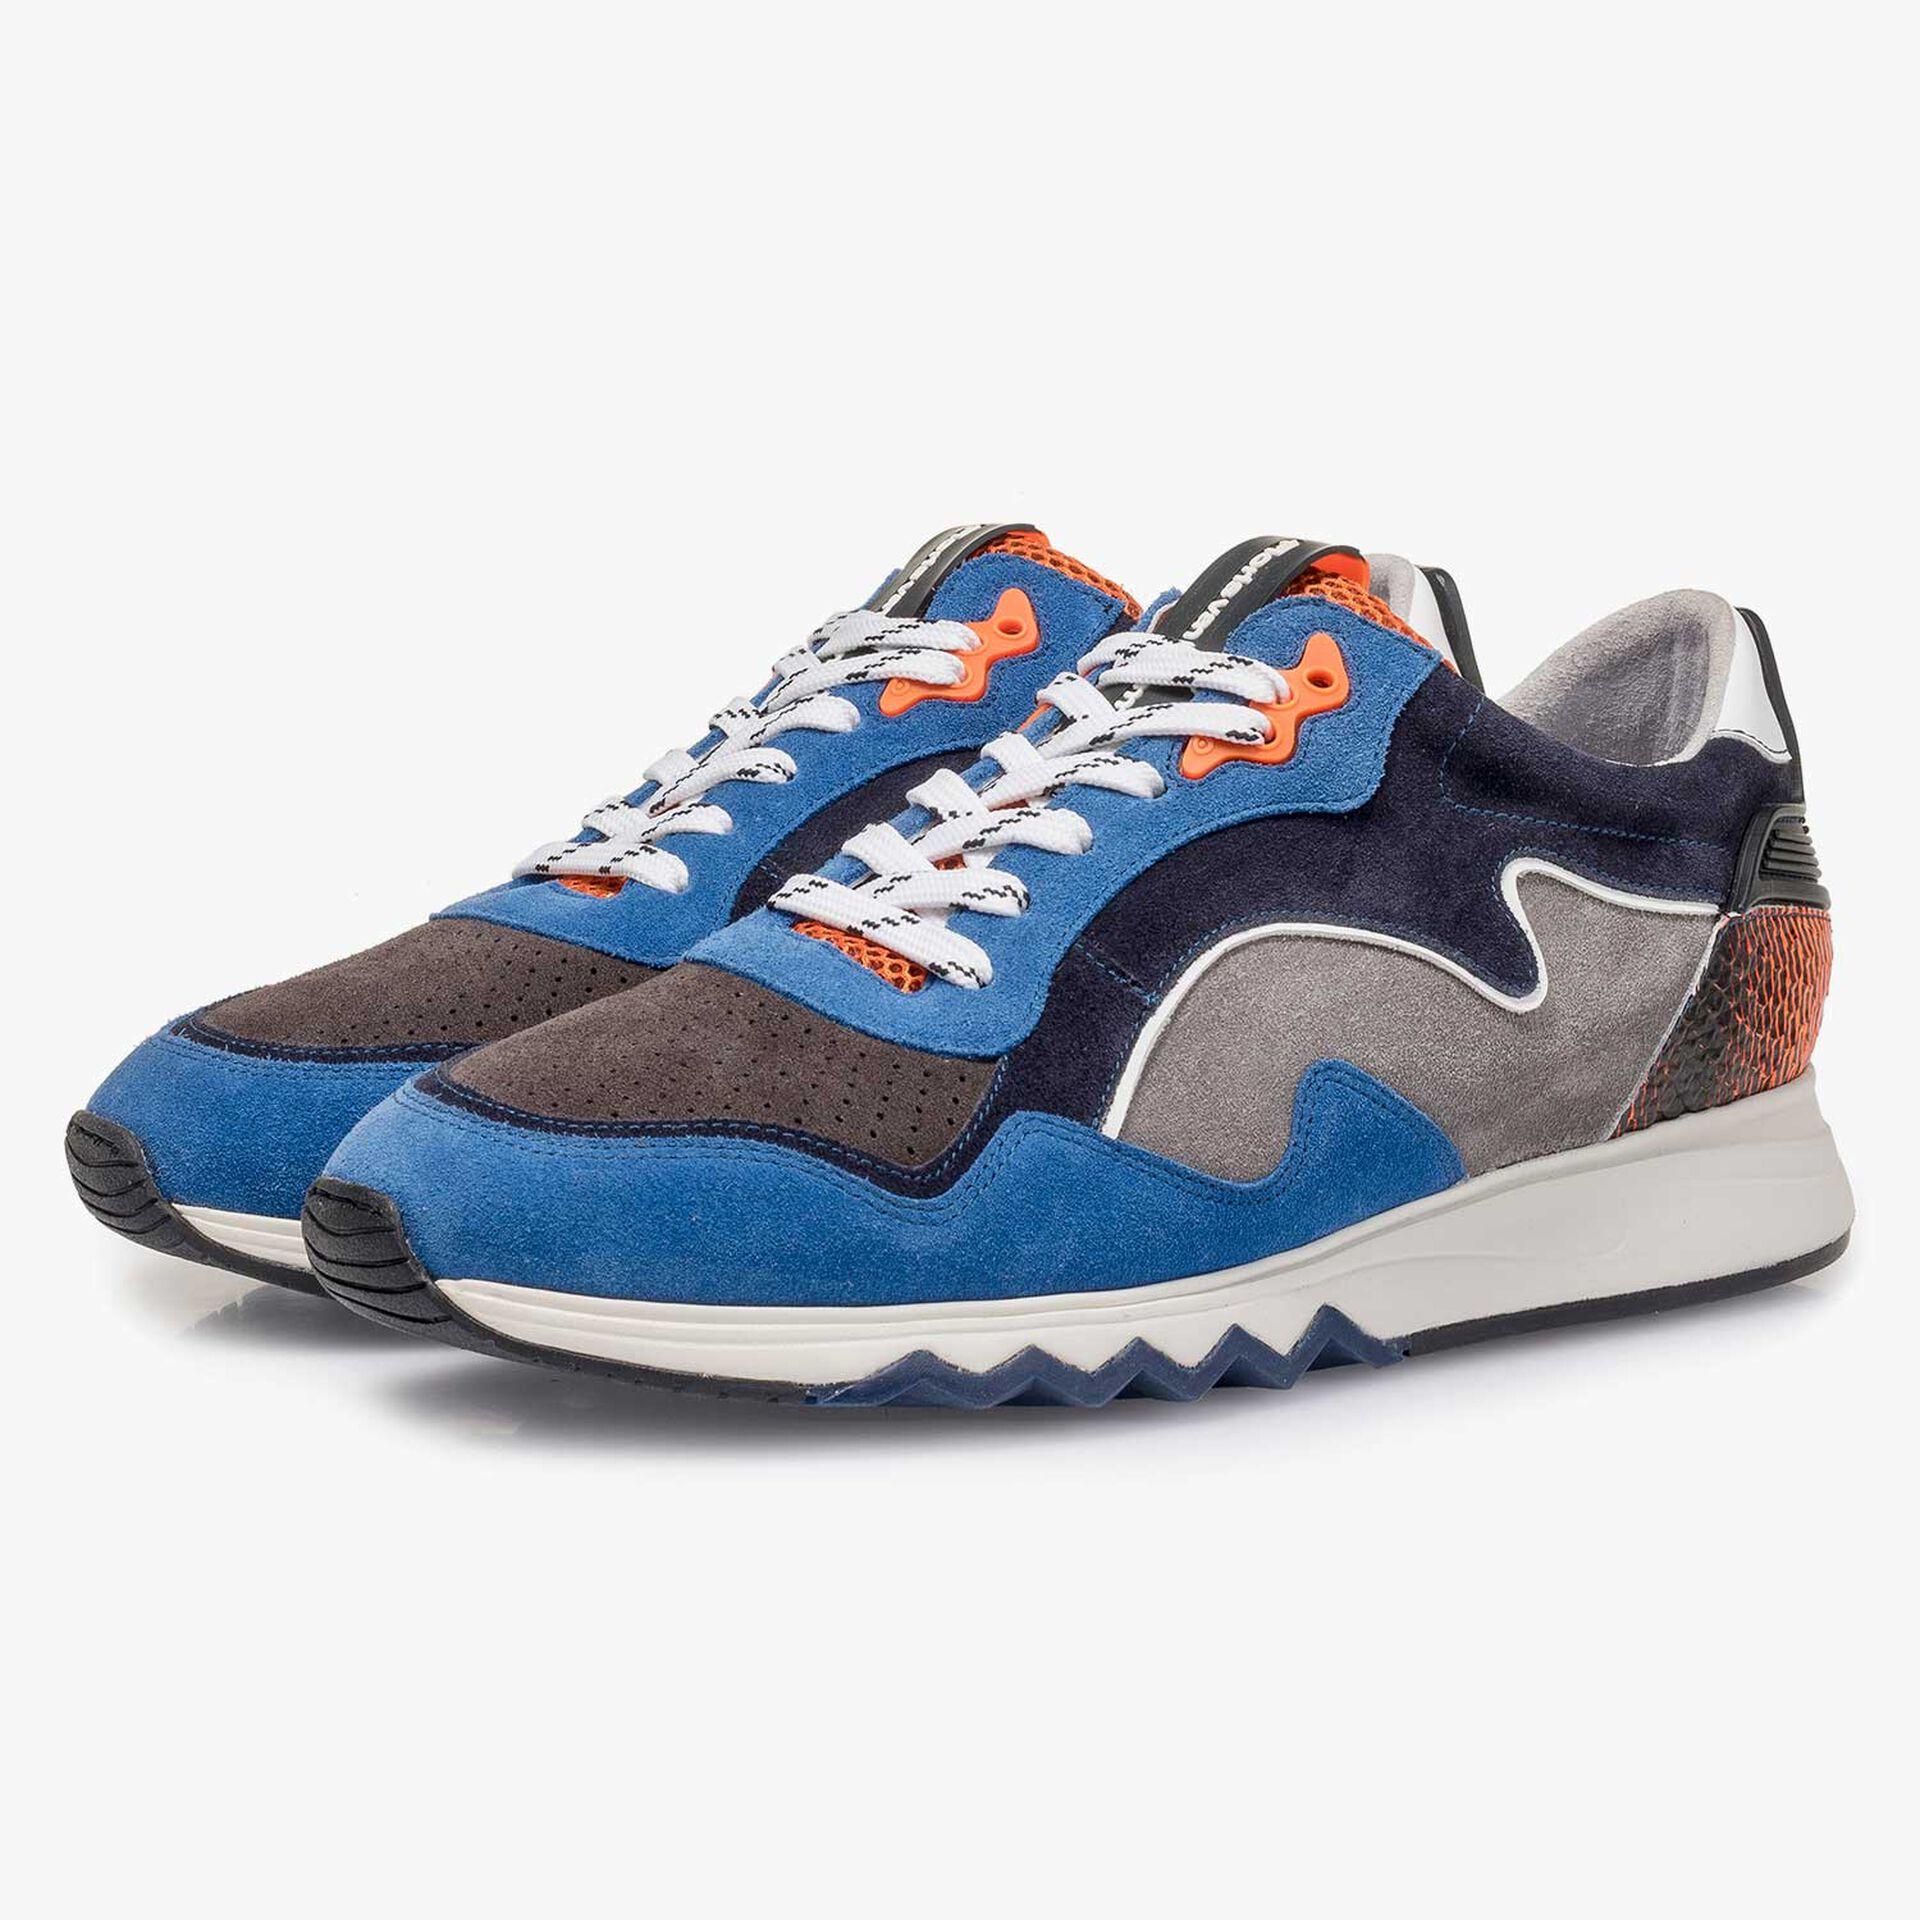 Blue-orange suede leather sneaker